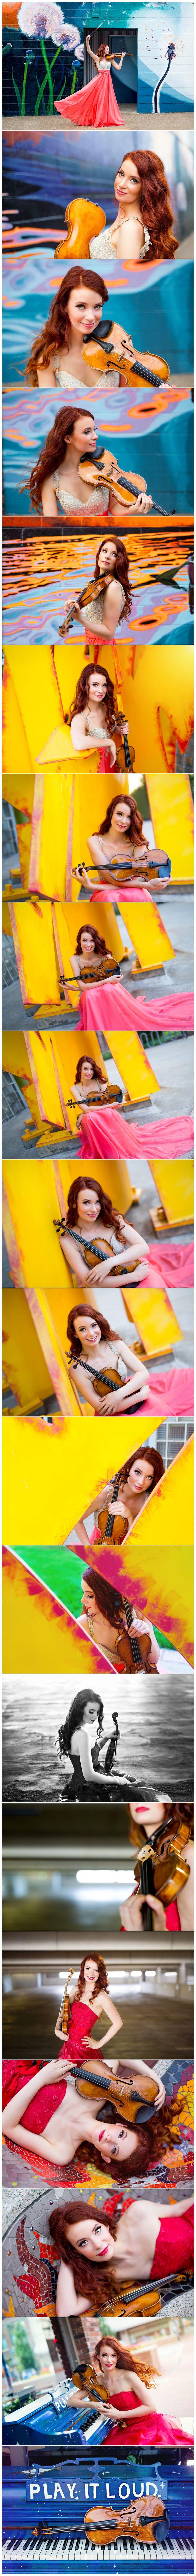 Chloé Trevor's violinist headshots, photographed by Boston headshot photographer Kate Lemmon. // www.kateLphotography.com